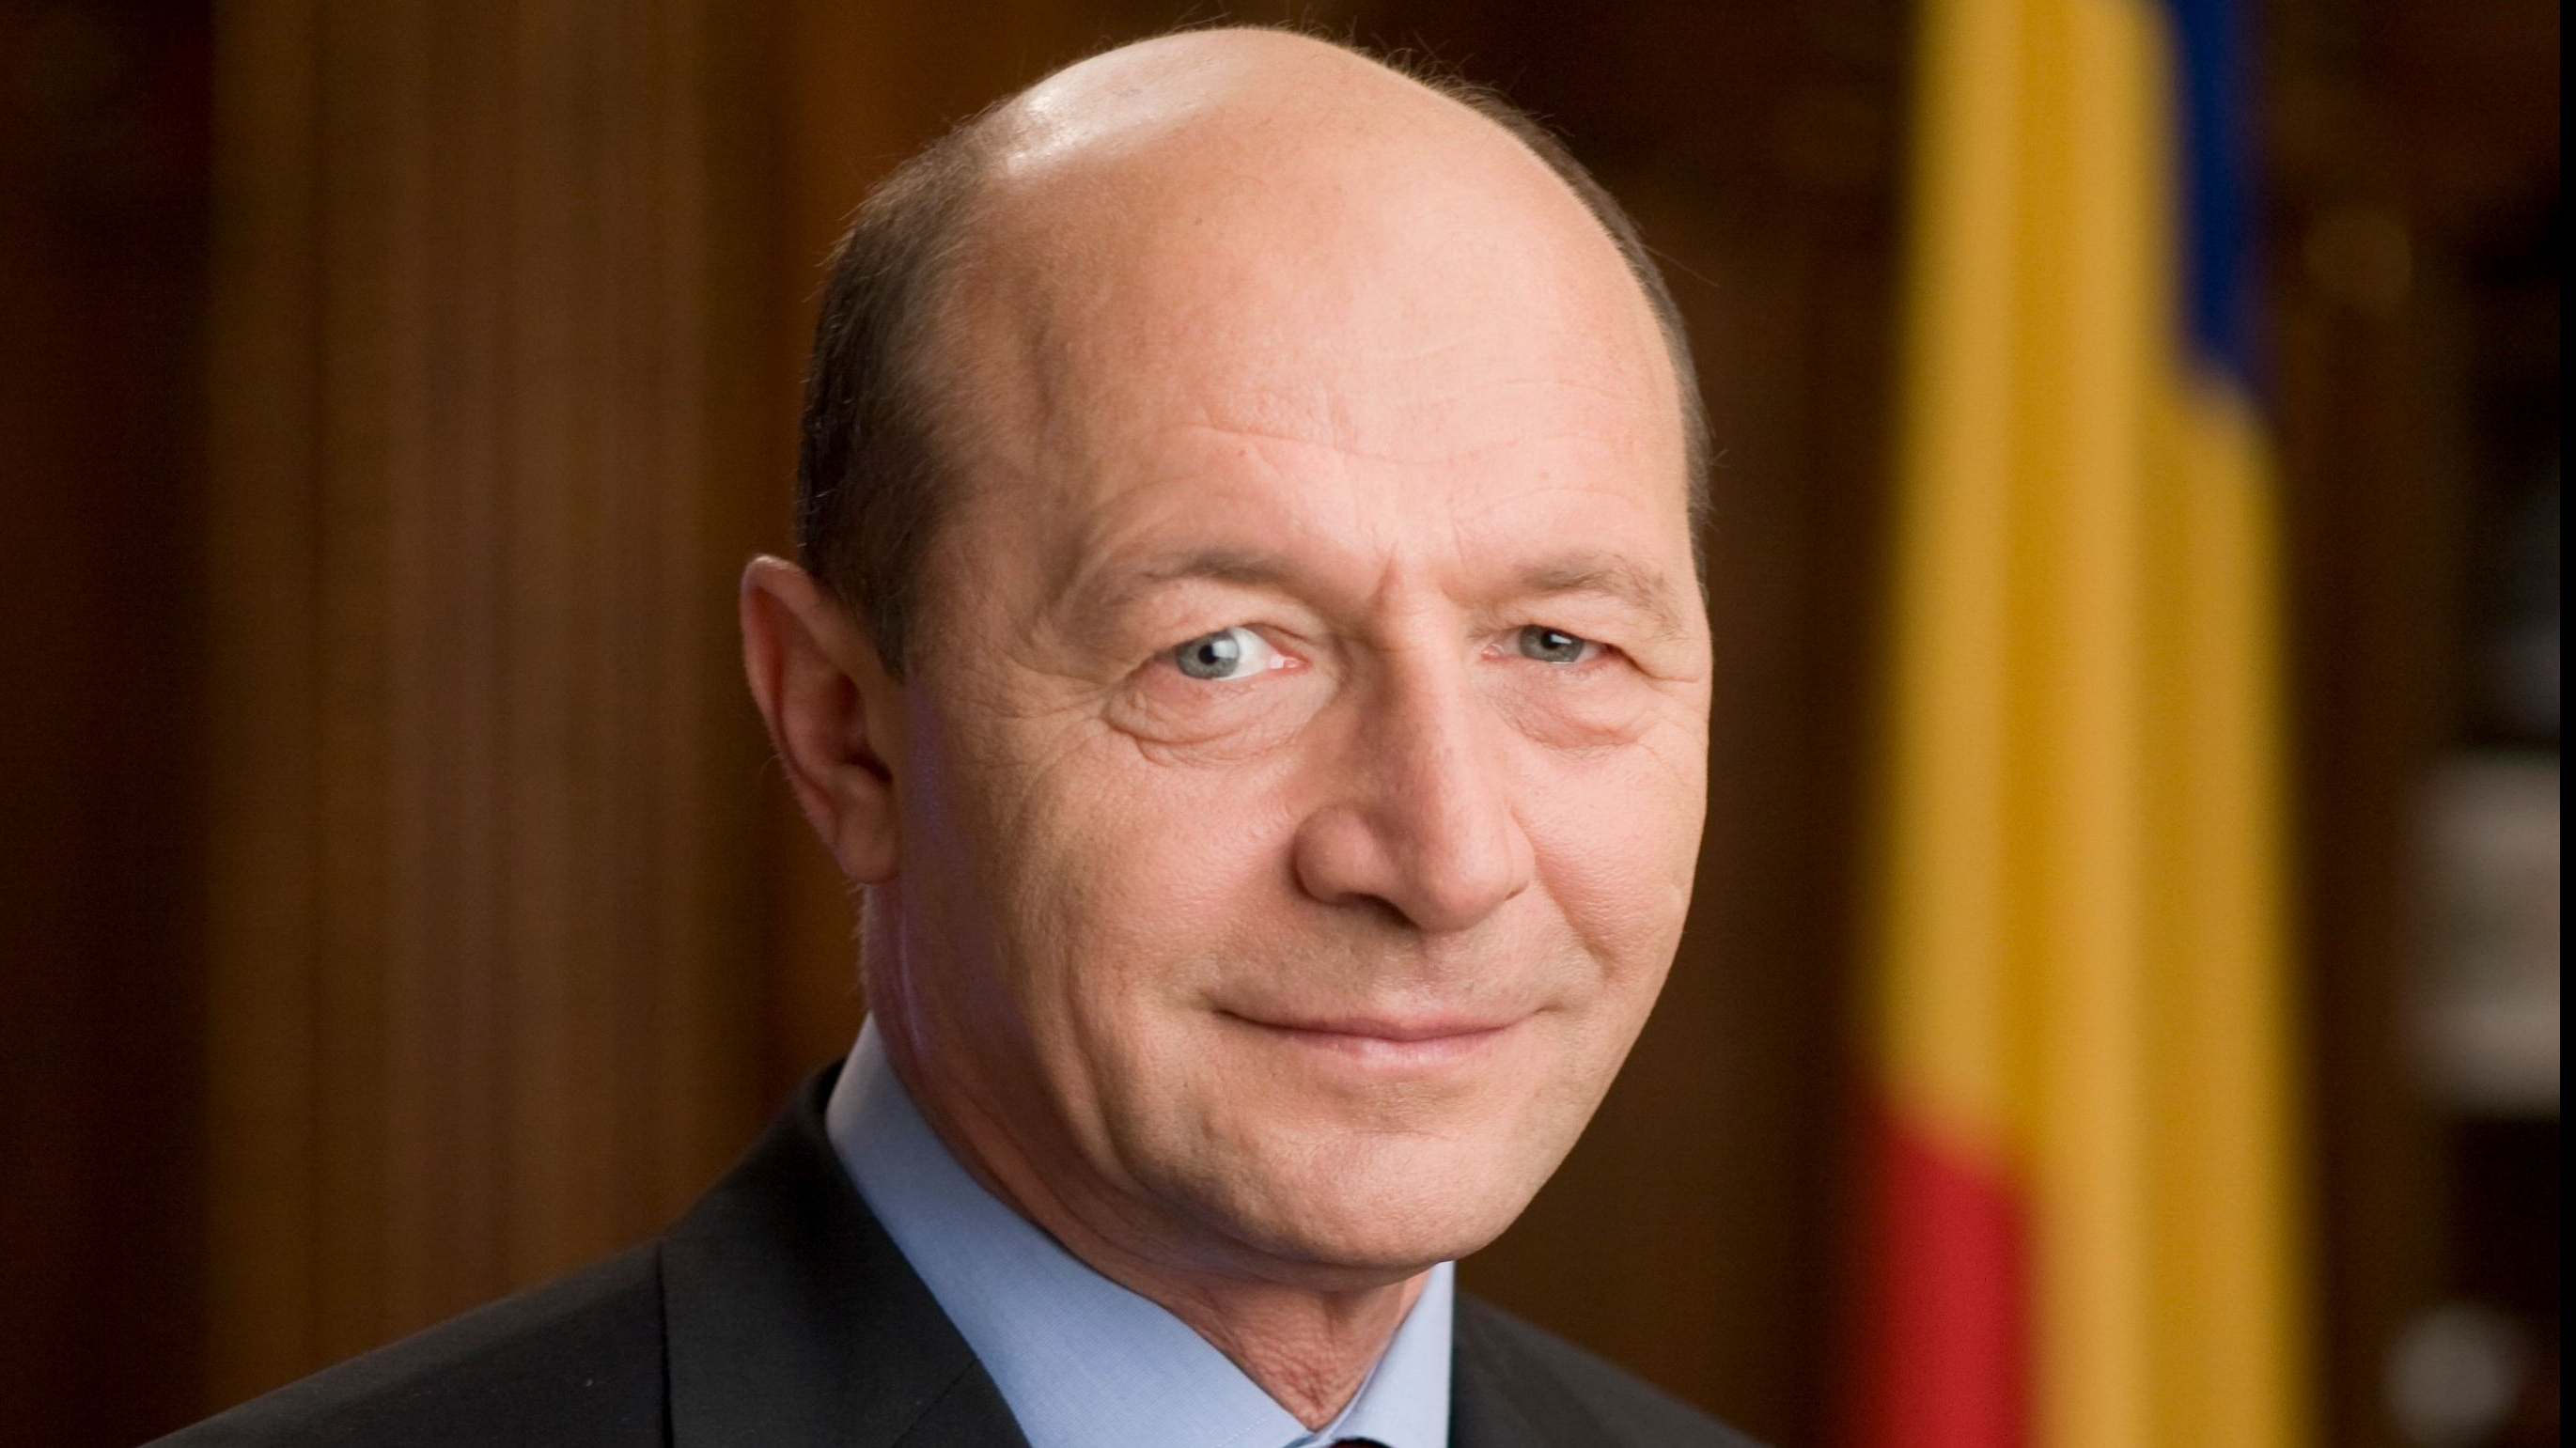 Traian Băsescu asasinat in camera lui din hotel la Milano